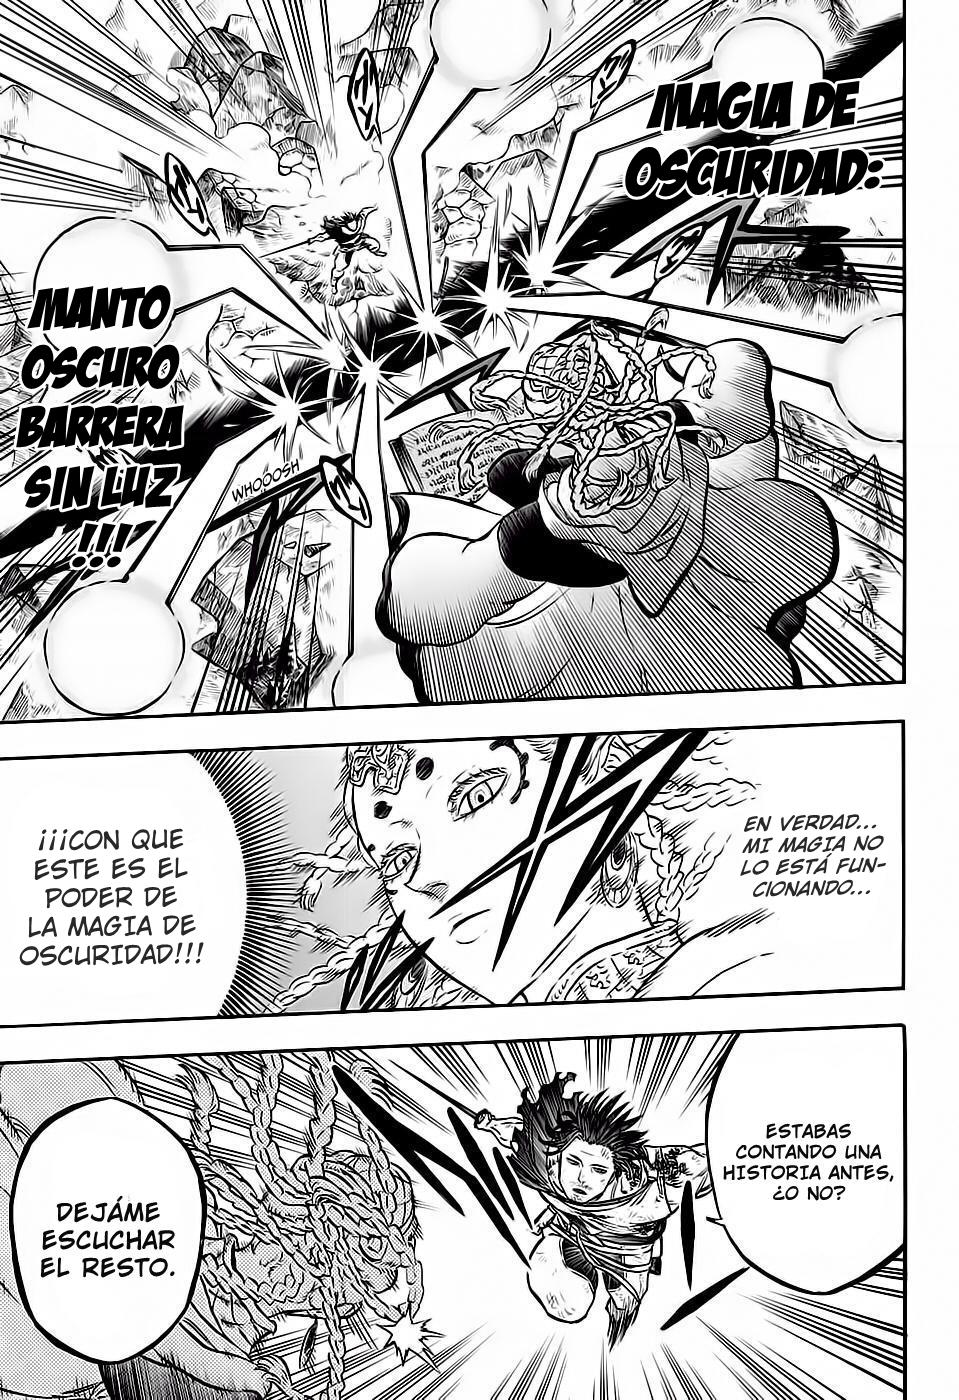 http://c5.ninemanga.com/es_manga/35/3811/444529/c157297d1a1ff043255bfb18530caaa2.jpg Page 6